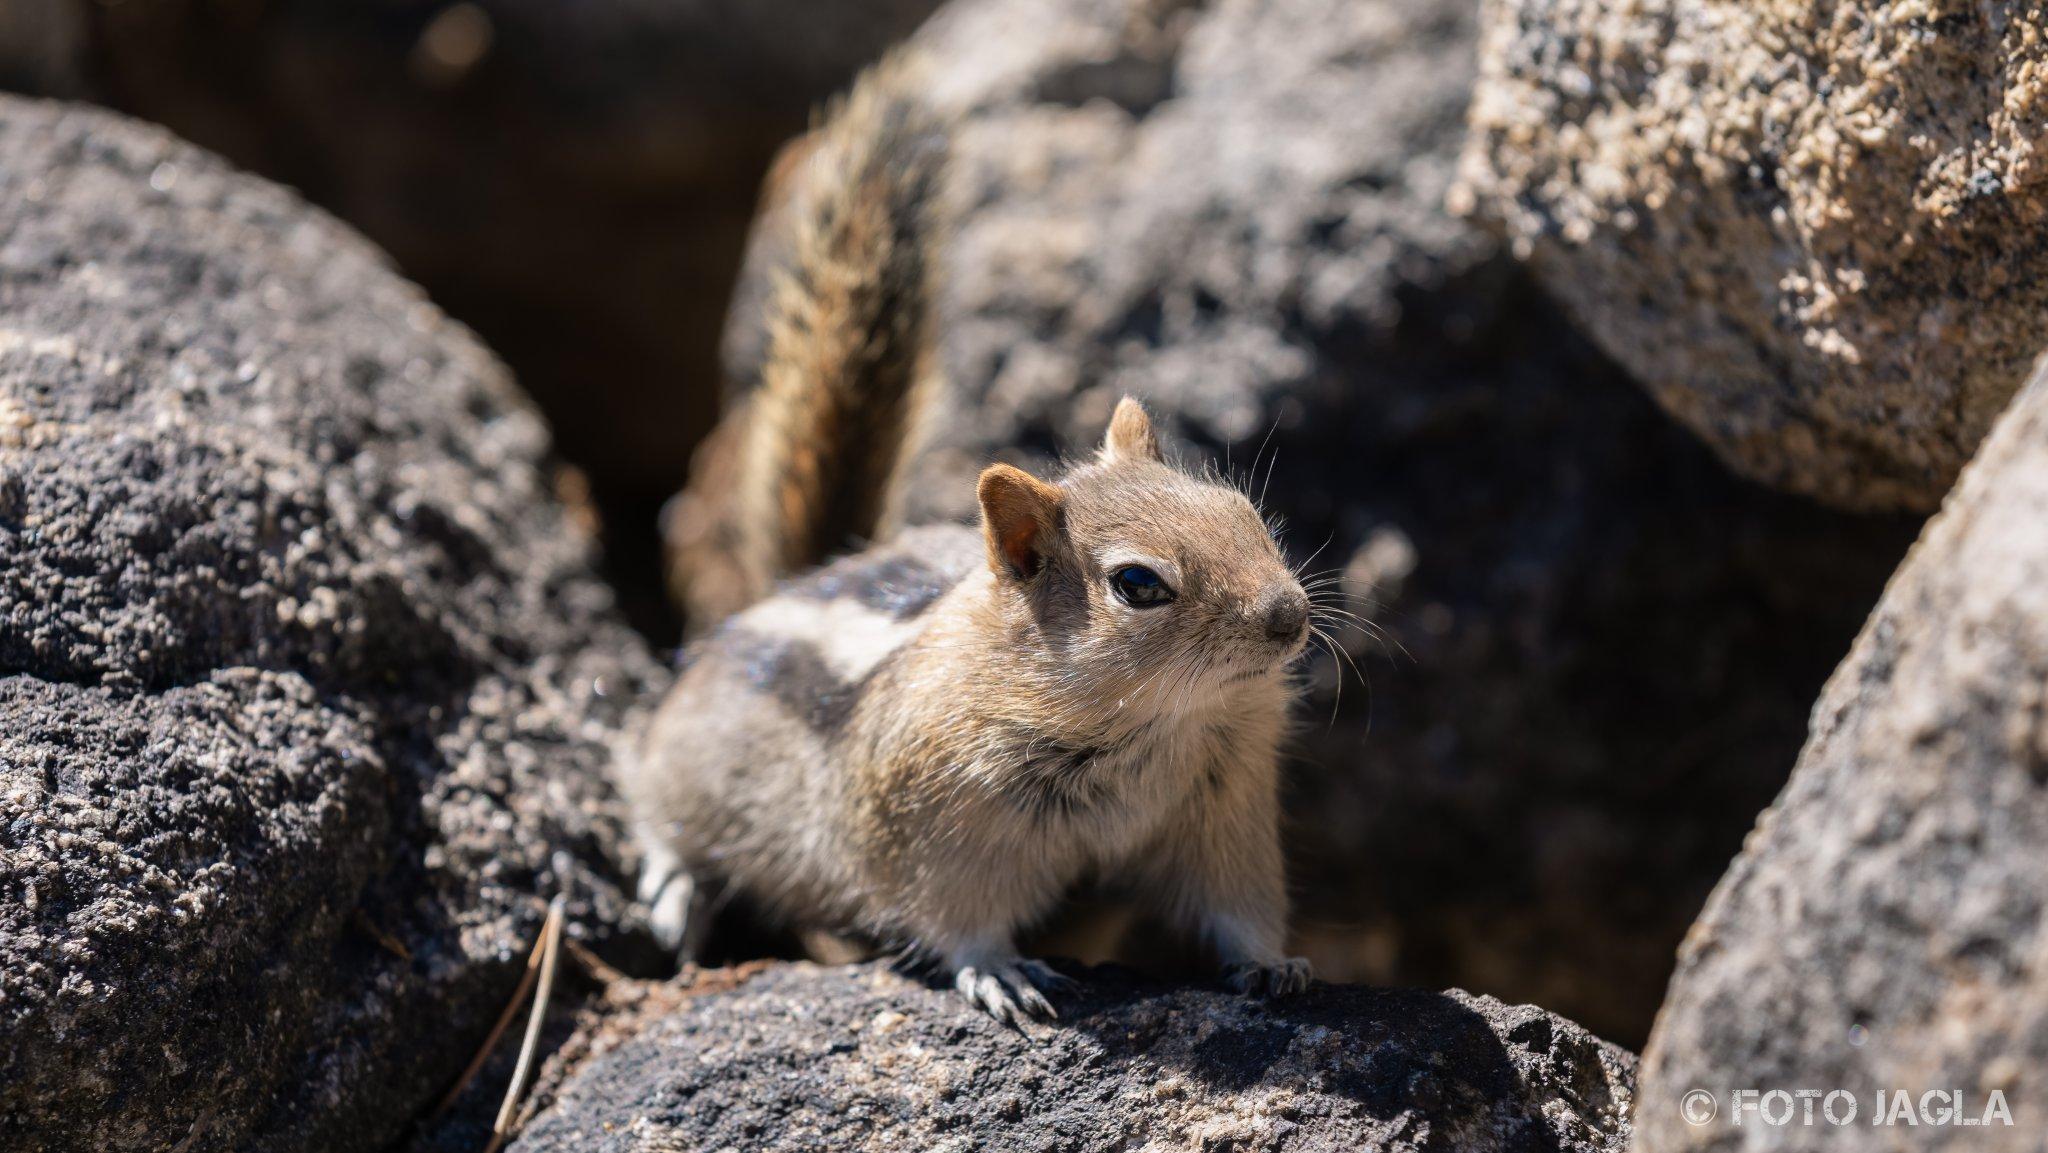 Kalifornien - September 2018 Streifenhörnchen (Chipmunk) am Tenaya Lake Yosemite National Park - Wawona